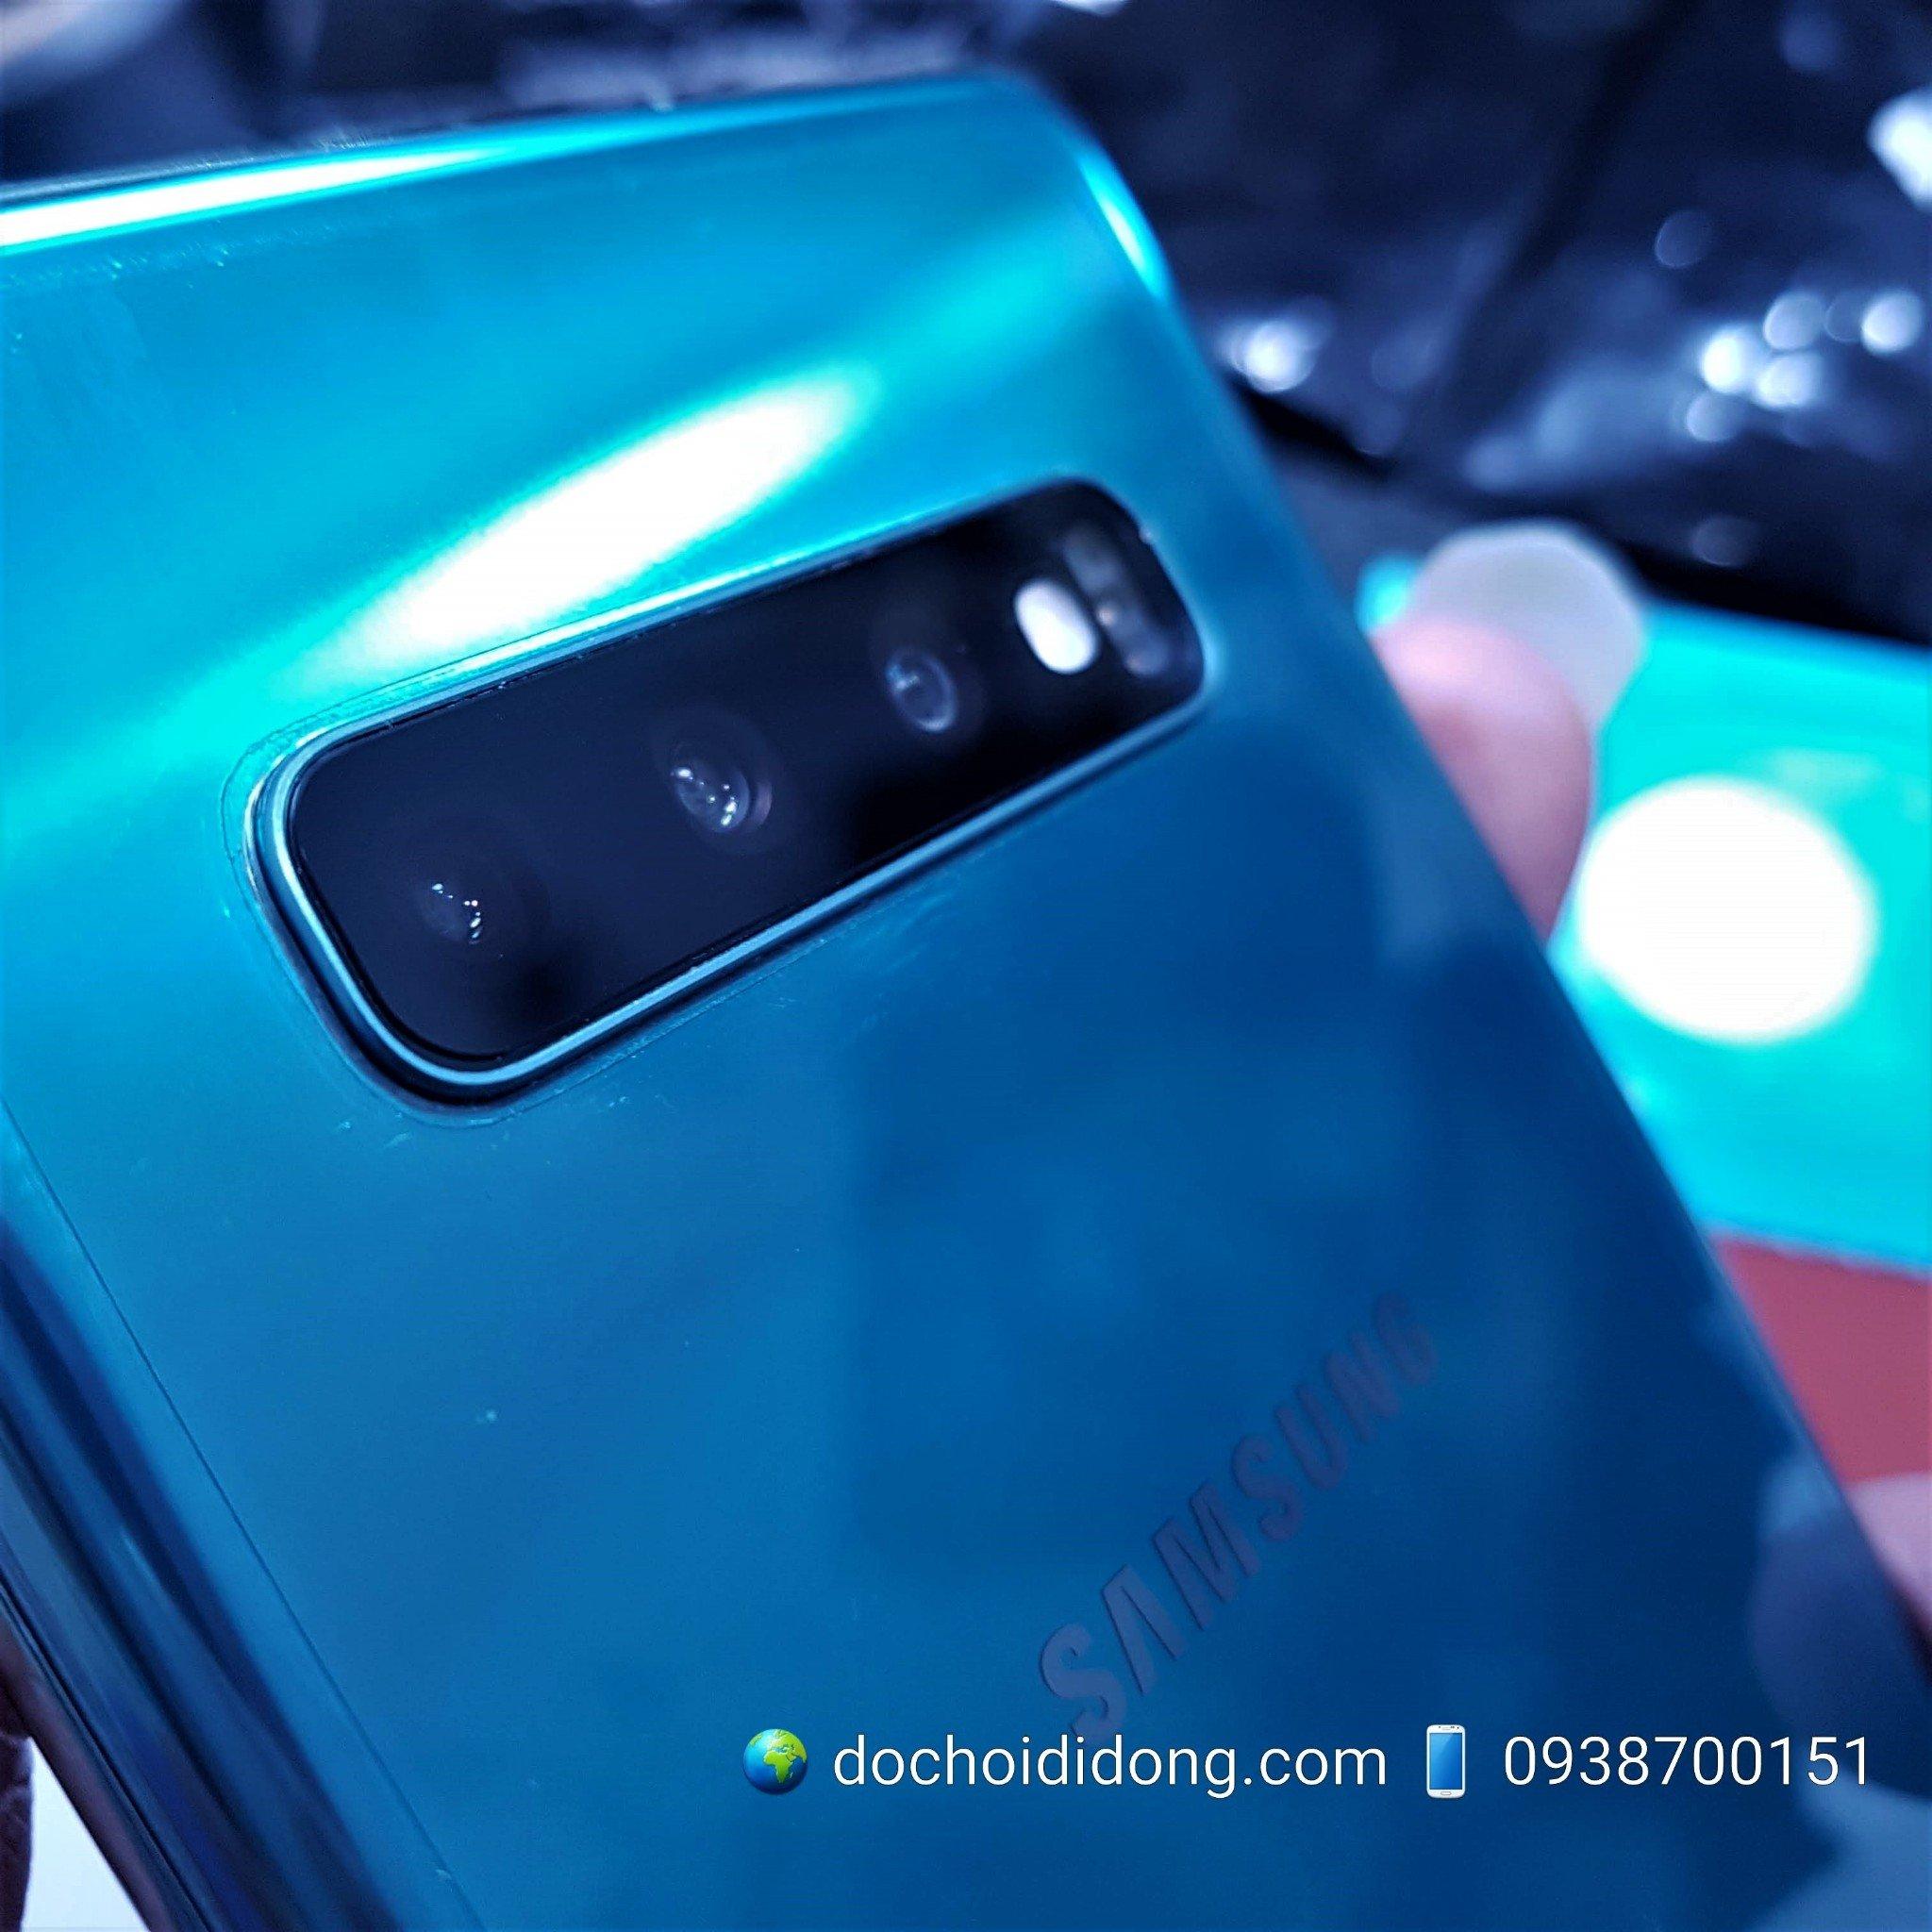 Miếng dán cường lực camera Samsung S10 Plus 2.5D